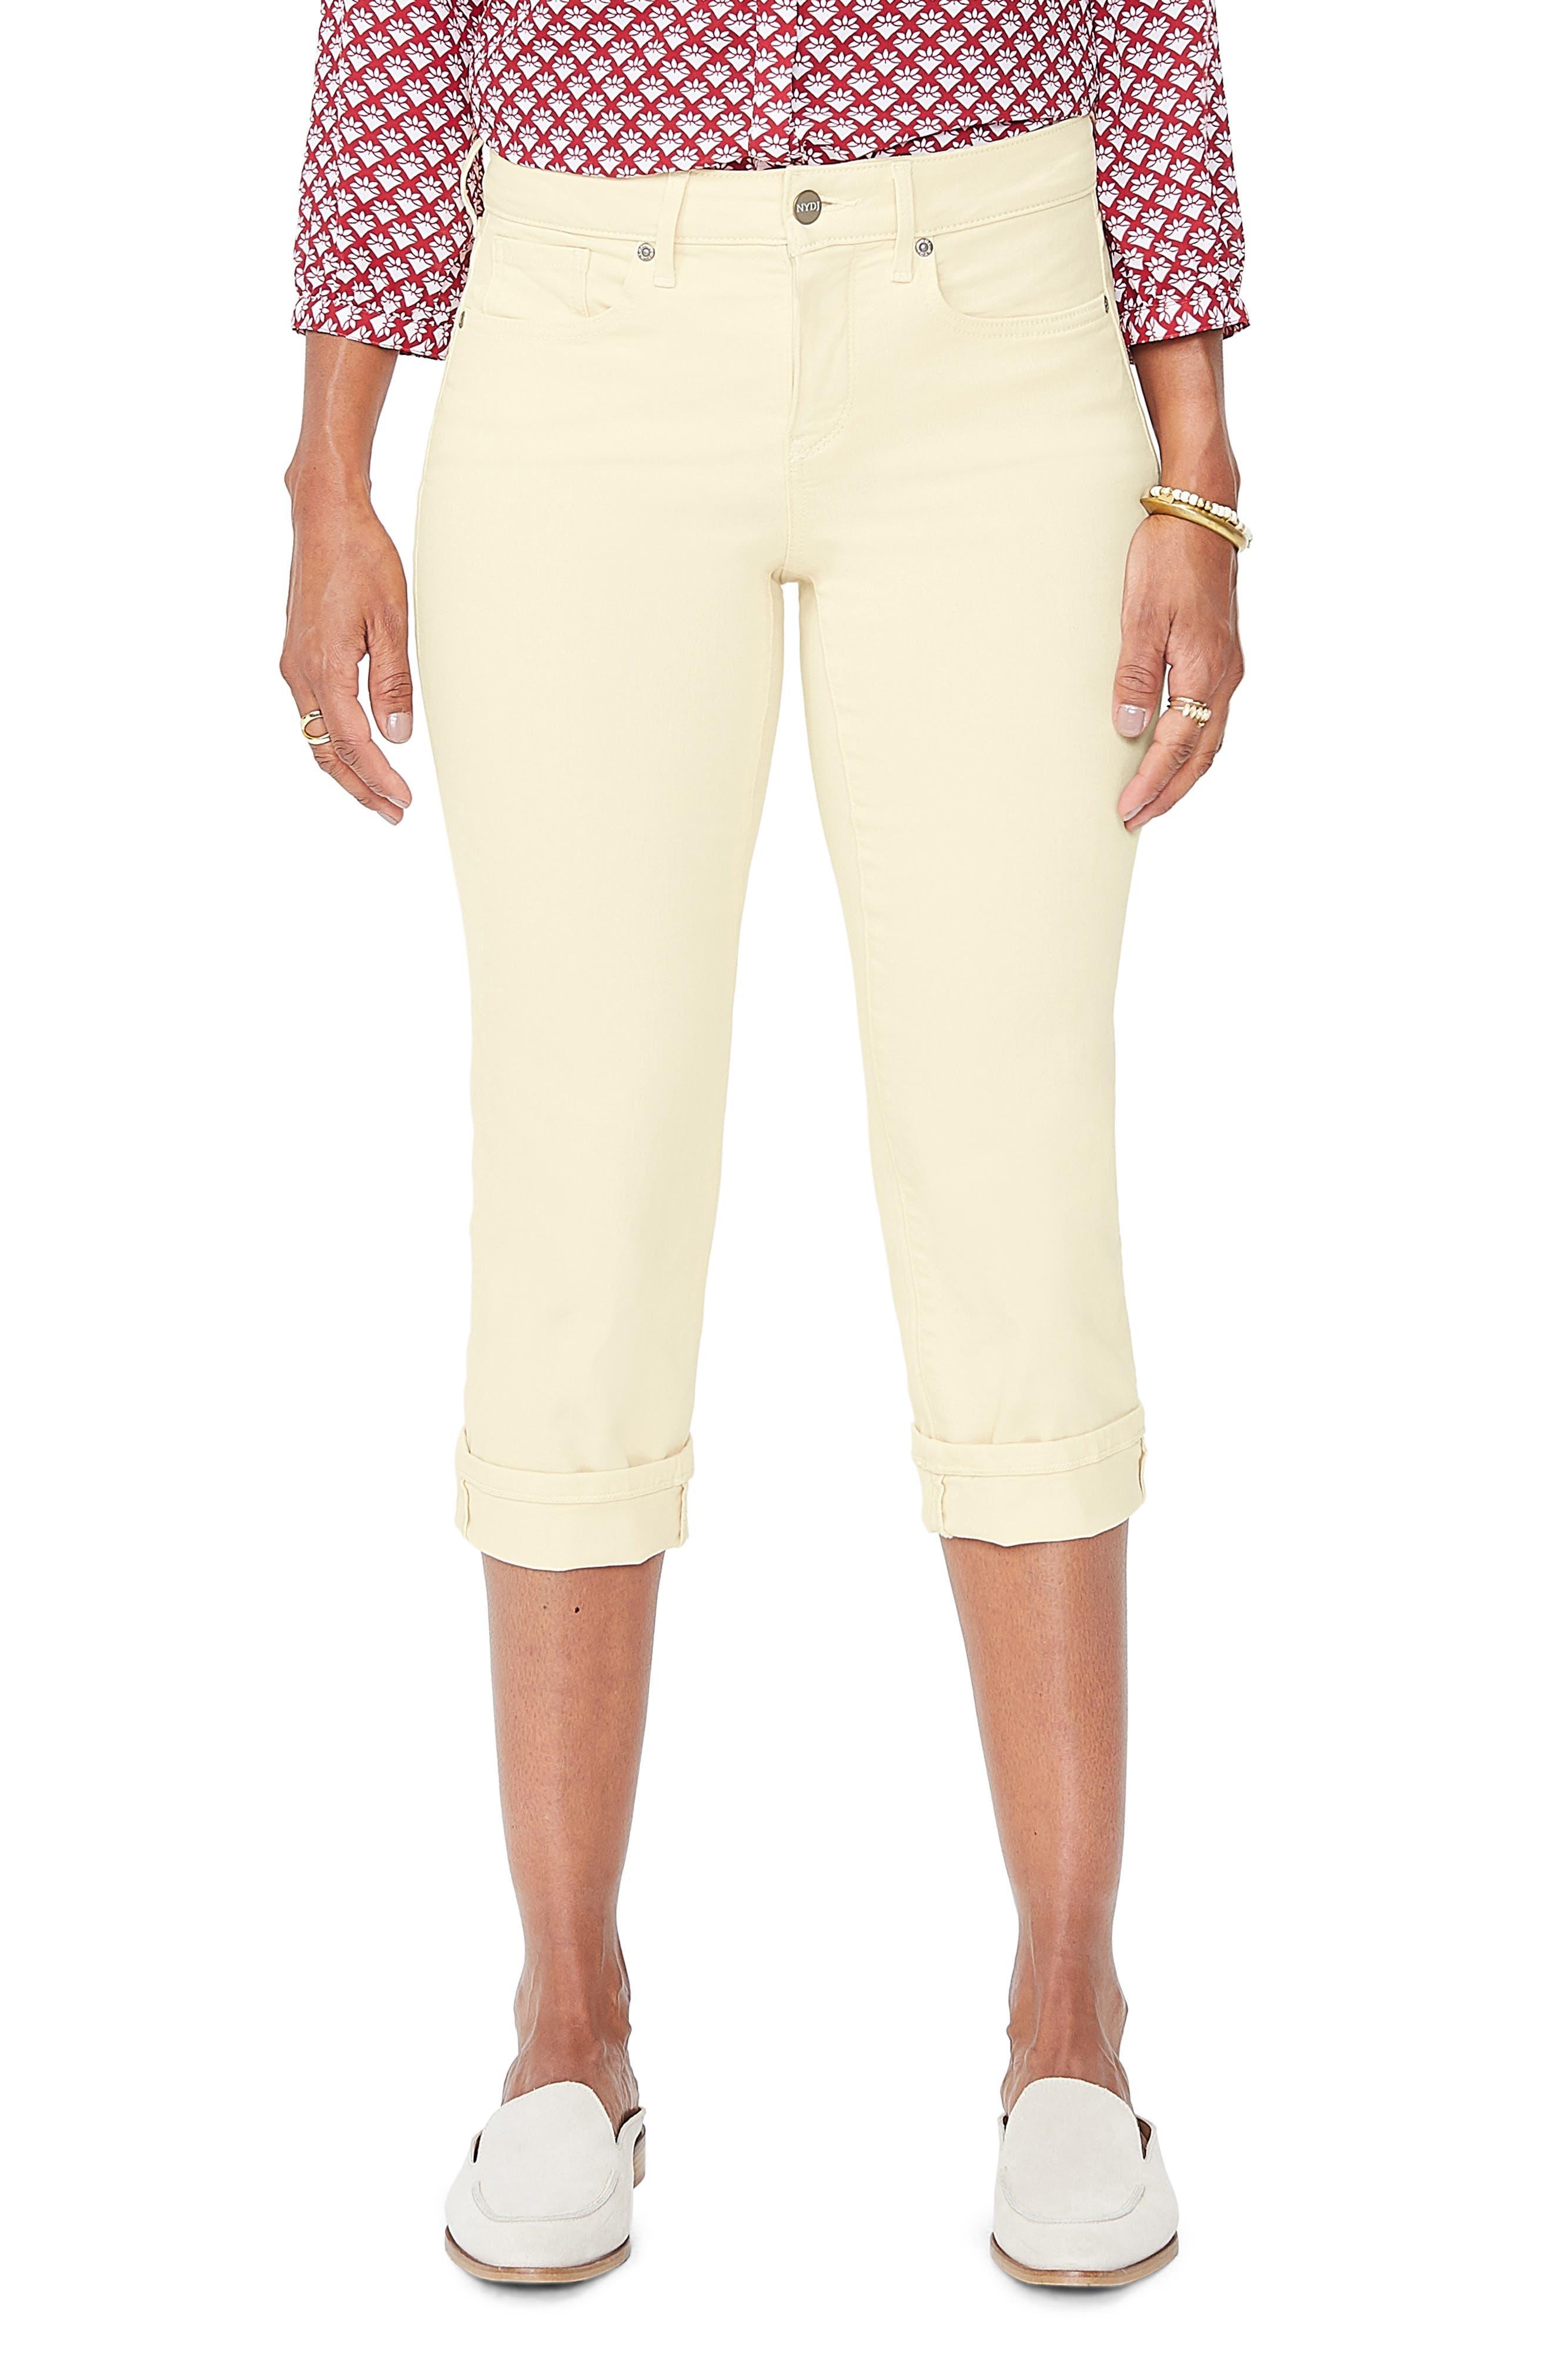 Mixed Intimate Items New Fashion Nydj Womens 12 Petite Khaki Jean Bermuda Shorts